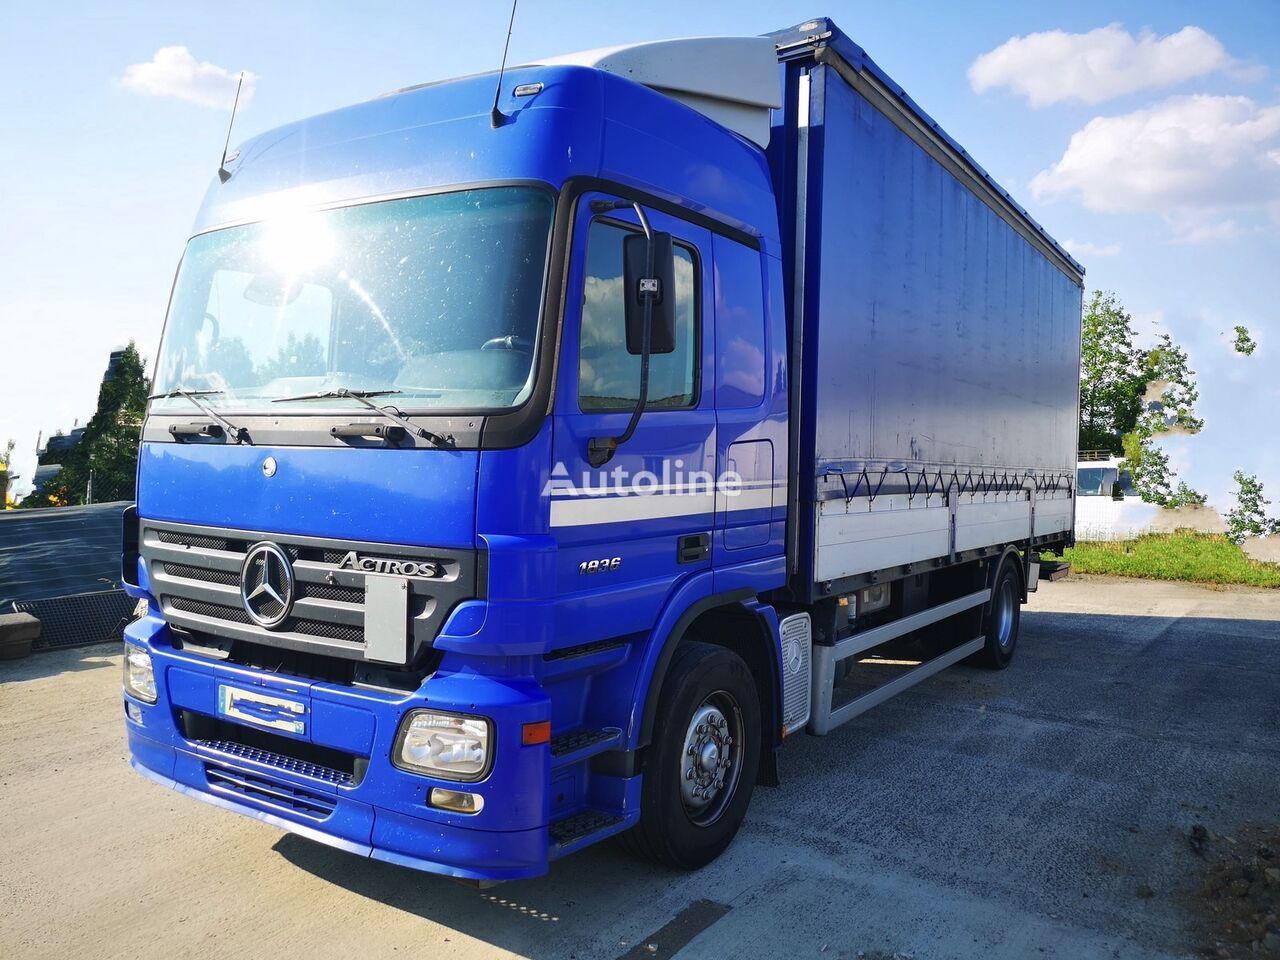 MERCEDES-BENZ Actros 1836 + LIFT EURO 3 curtainsider truck